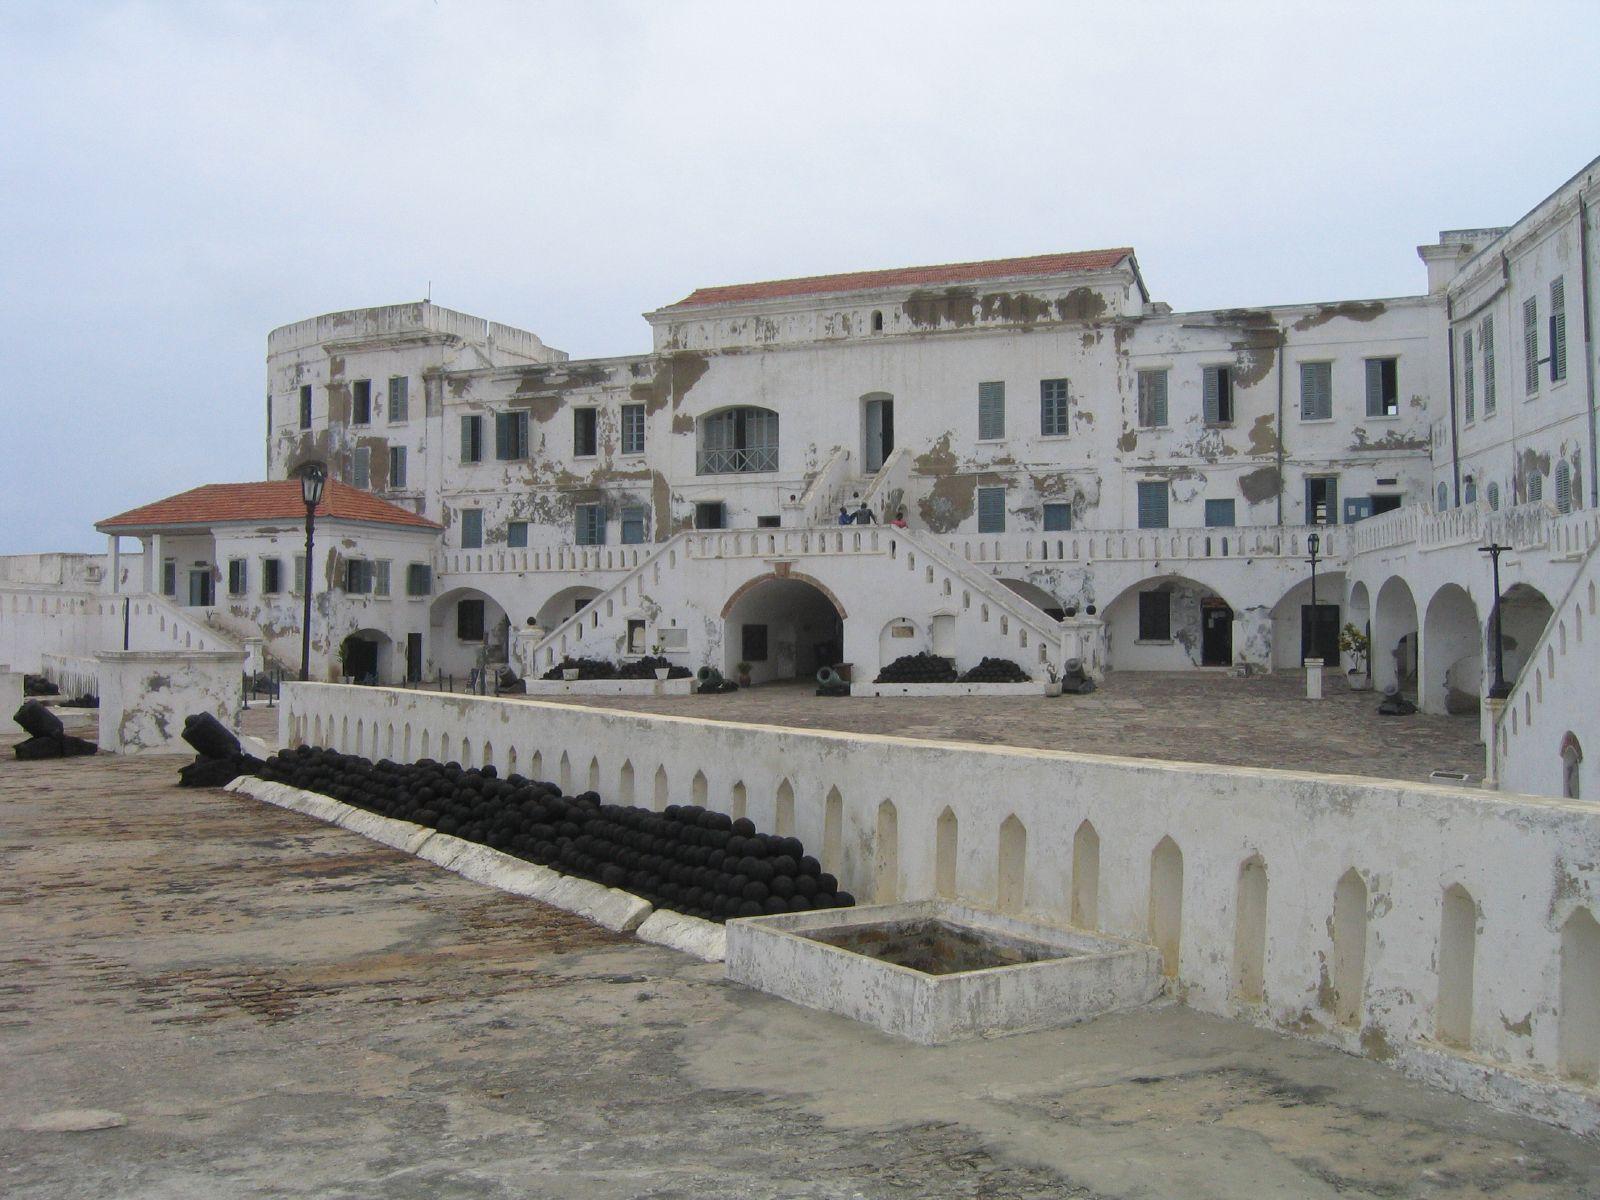 Cape Coast Ghana  city photo : Description Cape Coast Slave Castle